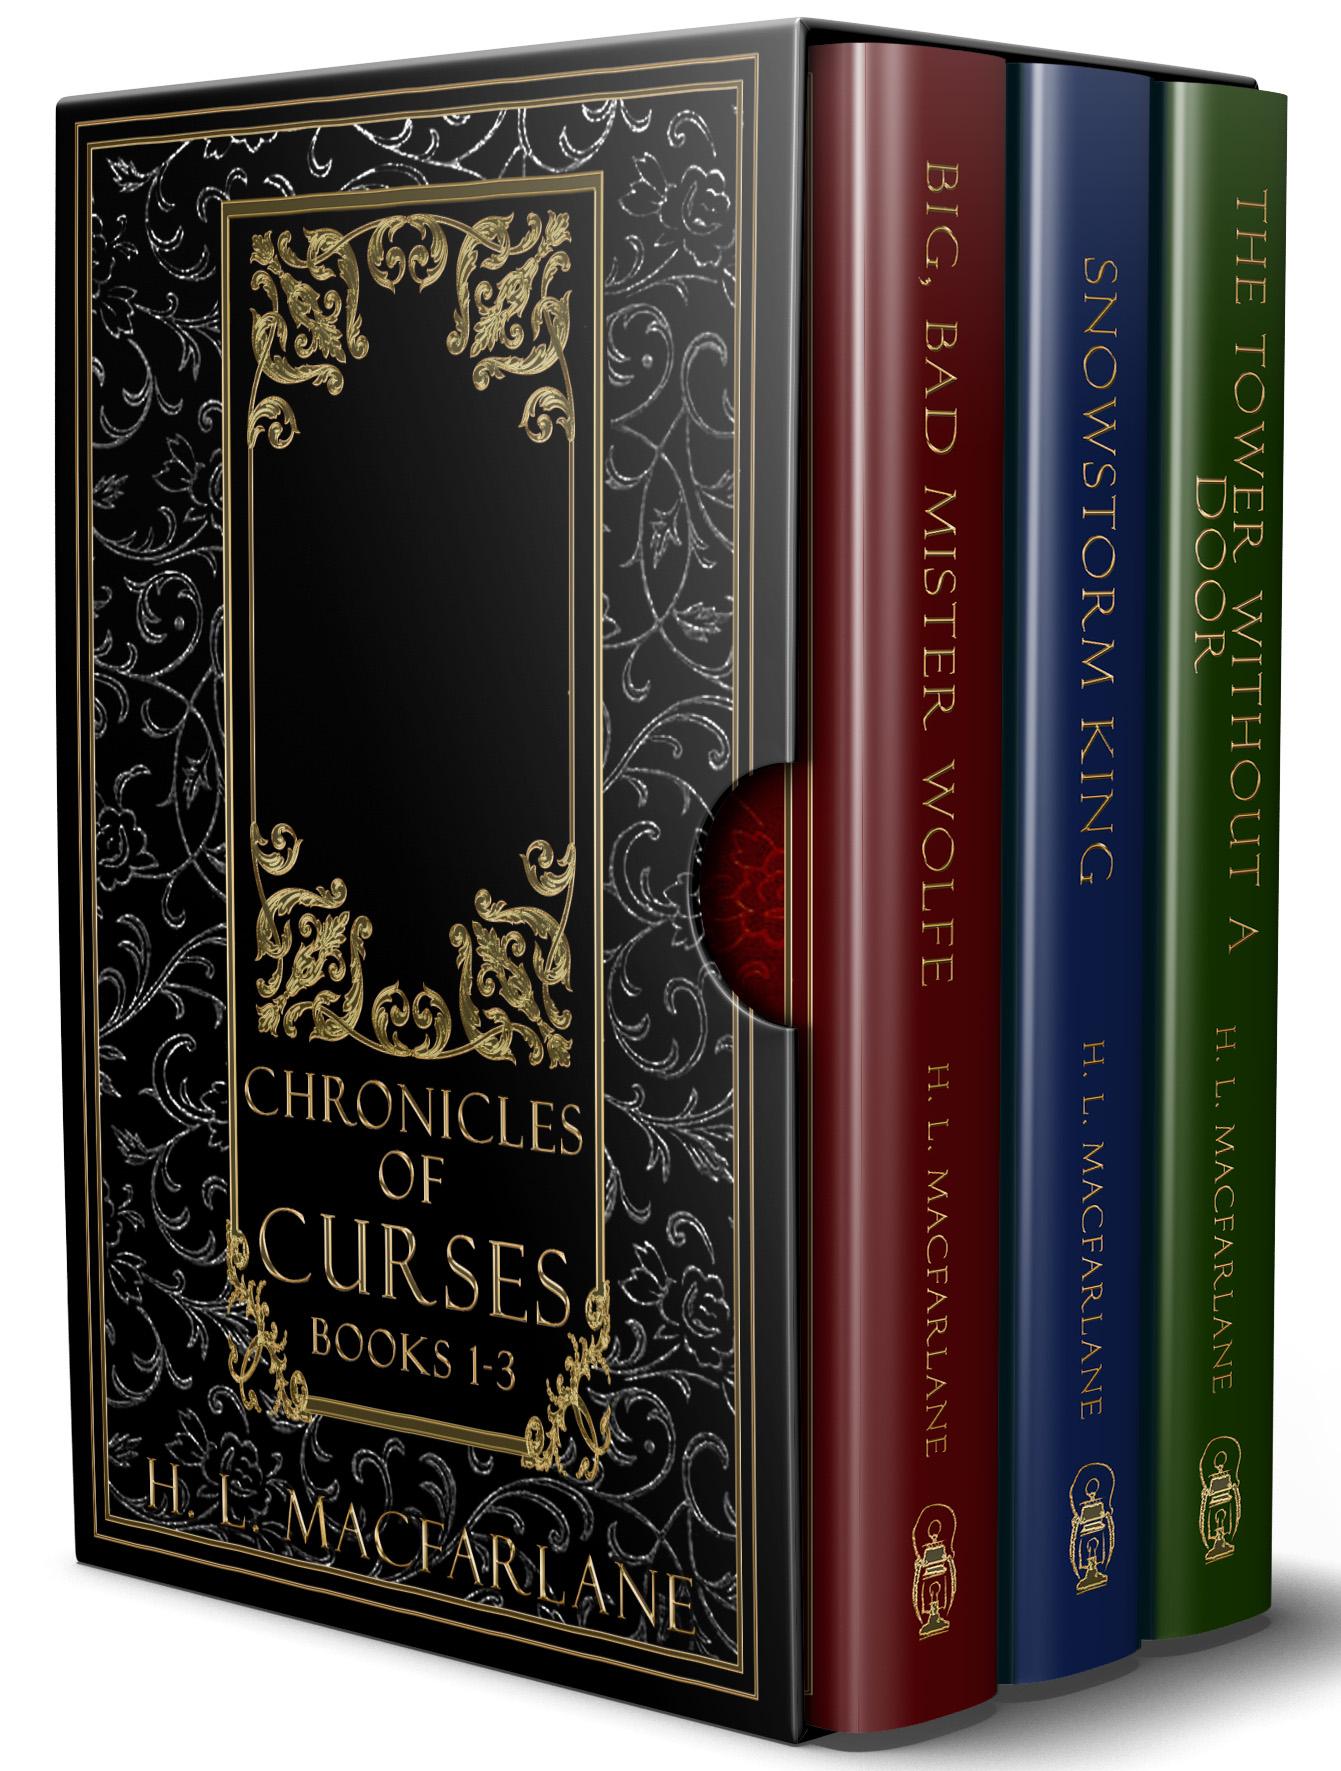 [PDF] [EPUB] Chronicles of Curses Books 1-3 Box Set Download by H.L. Macfarlane